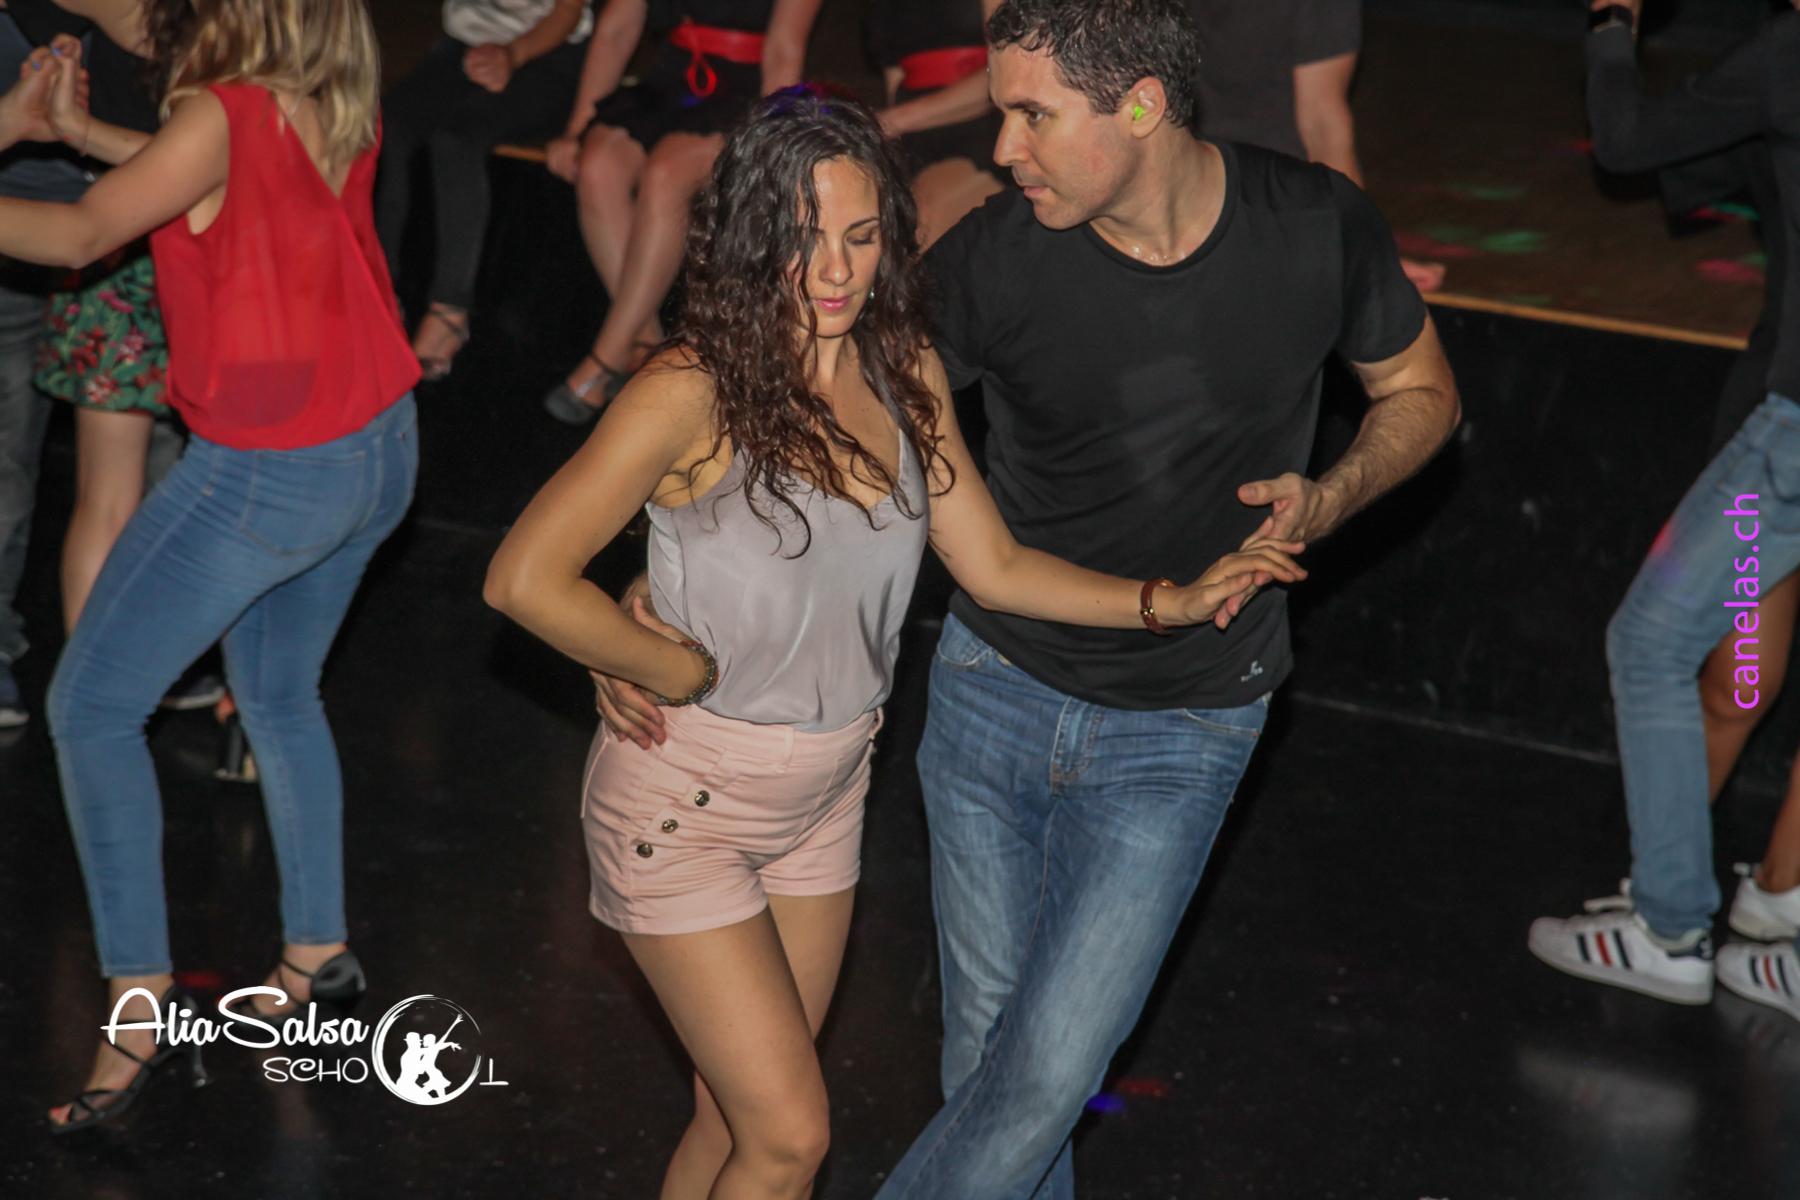 AliaSalsa ecole de danse lausanne soiree bachata salsa cubaineAlia Salsa Soireé Salsa - Bachata-46